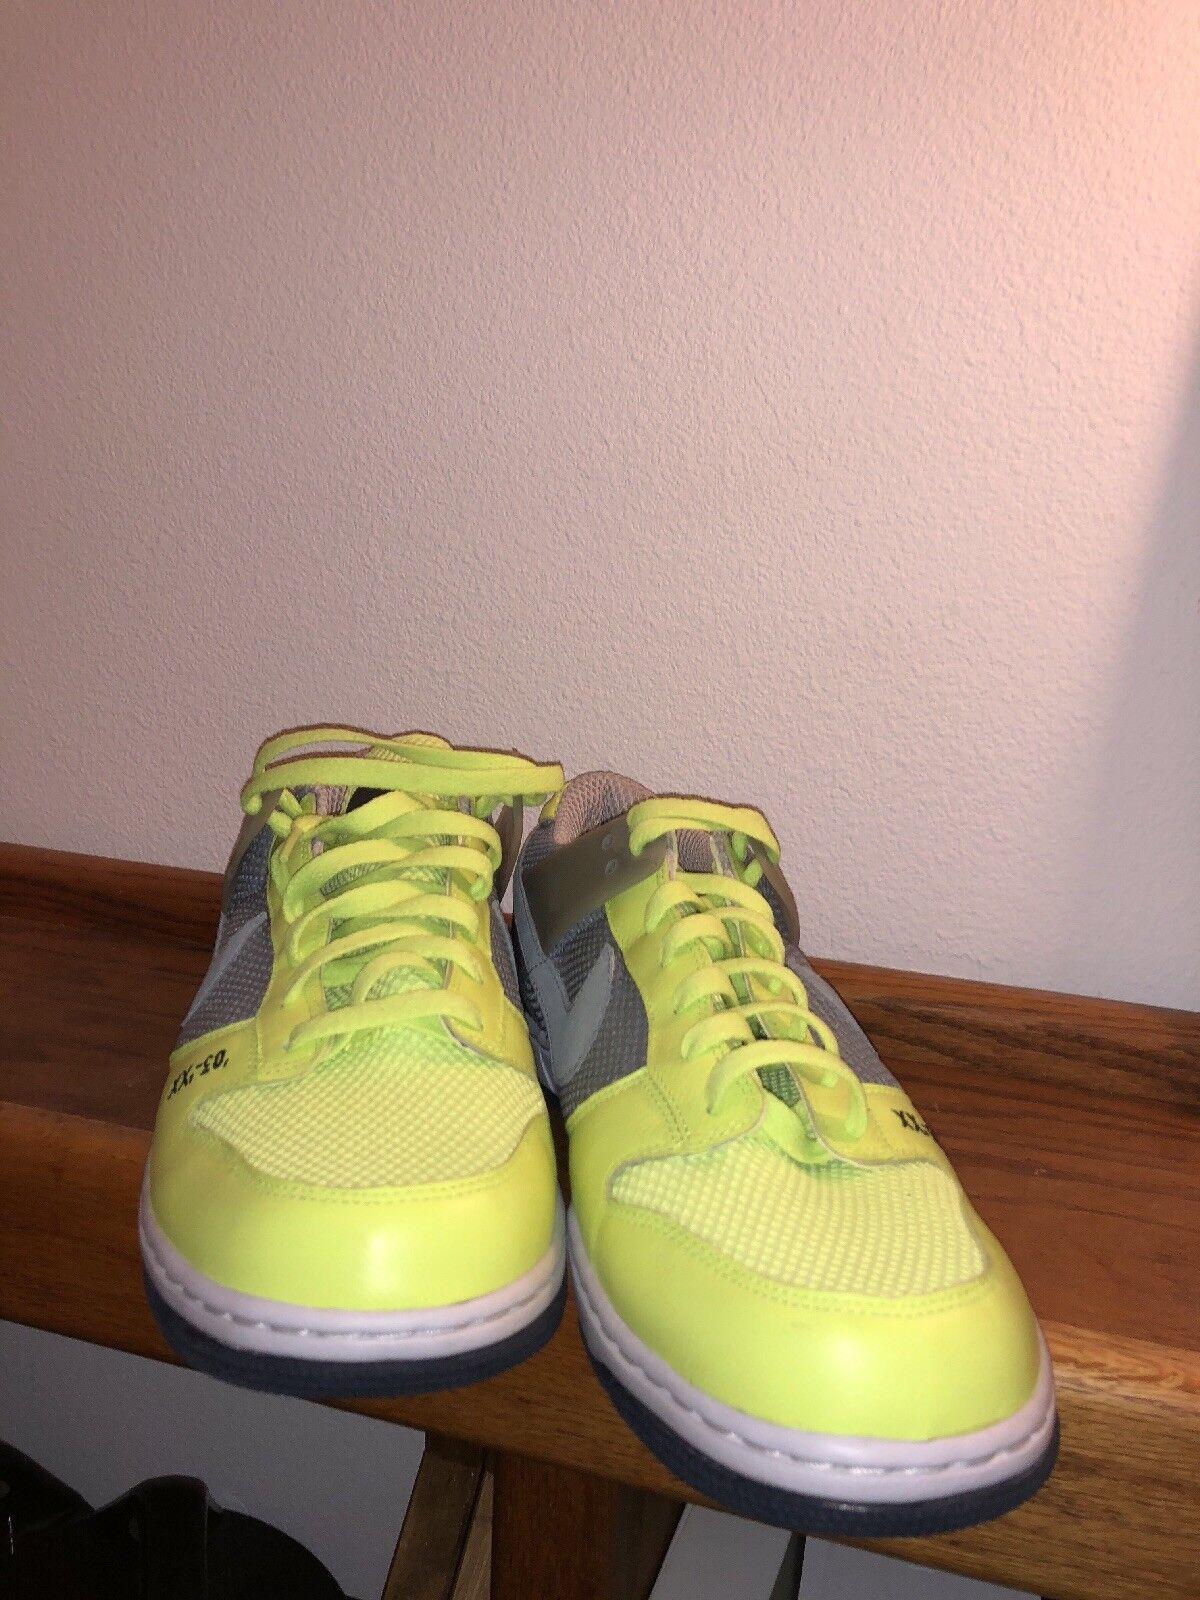 2007 Nike Air Zoom Dunk Sz14. Low Dunk Ronaldinho Union Grey Volt Sz14. Dunk 315207 002 619958